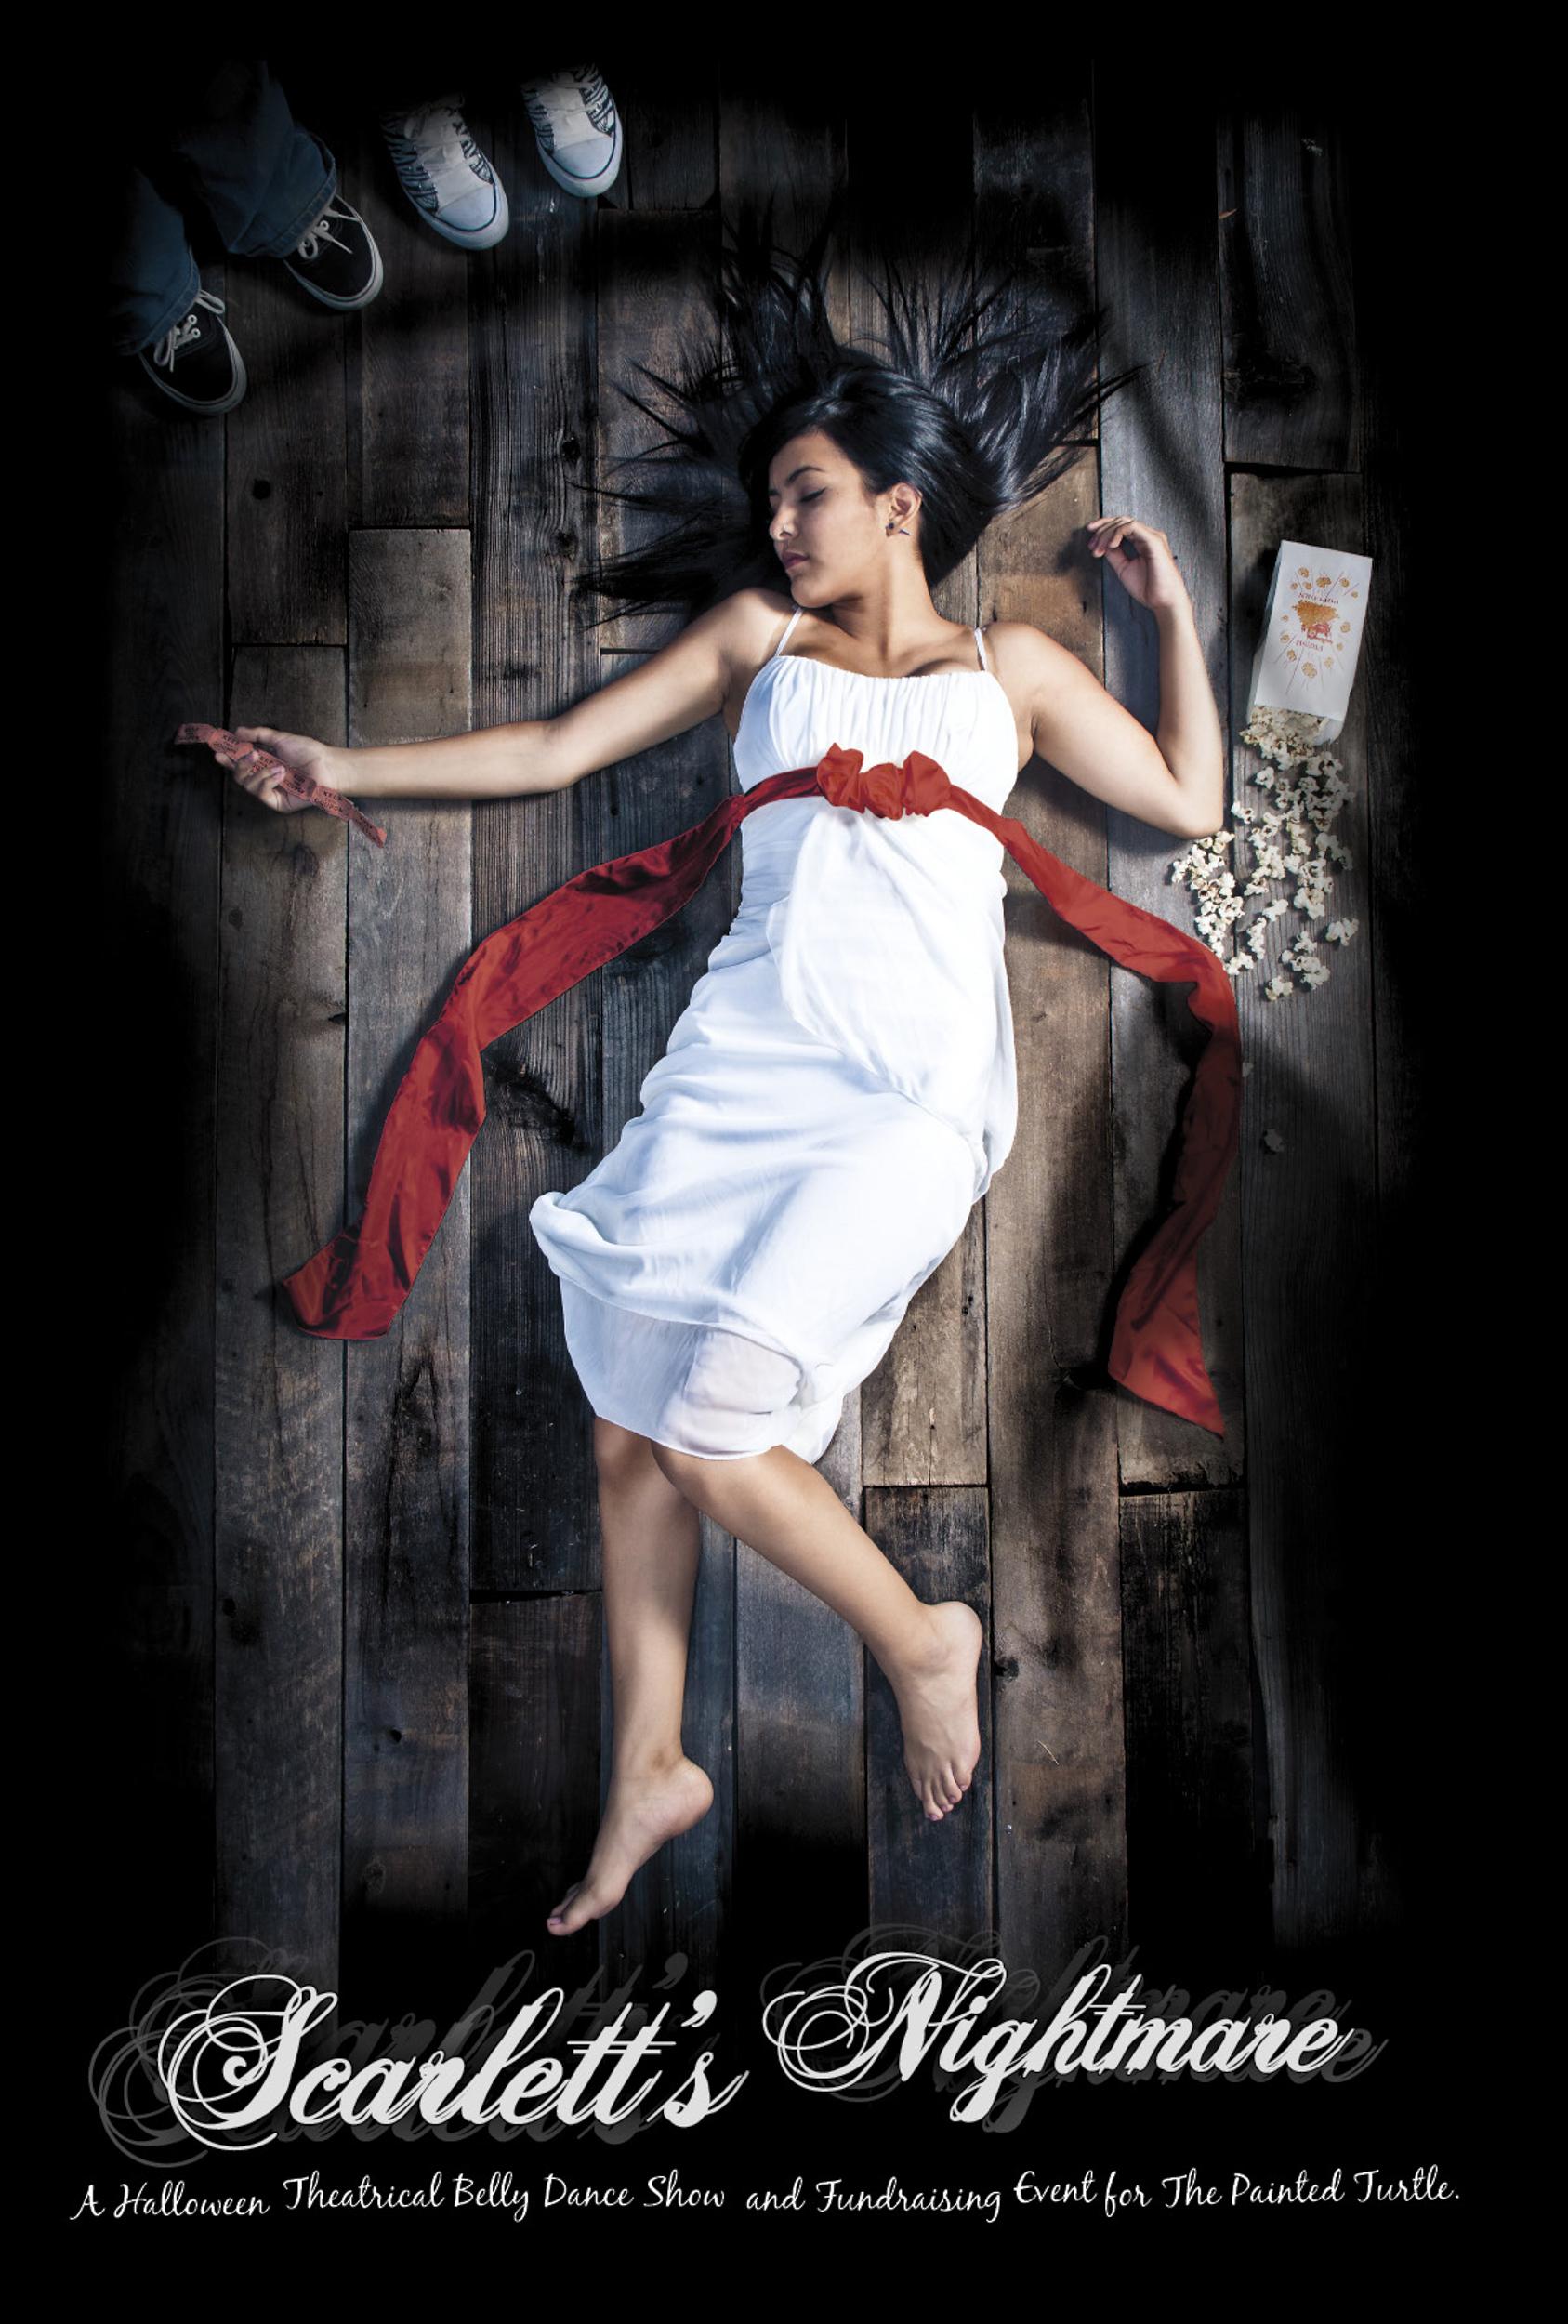 100925-Scarlett;s Nightmare-001.jpg